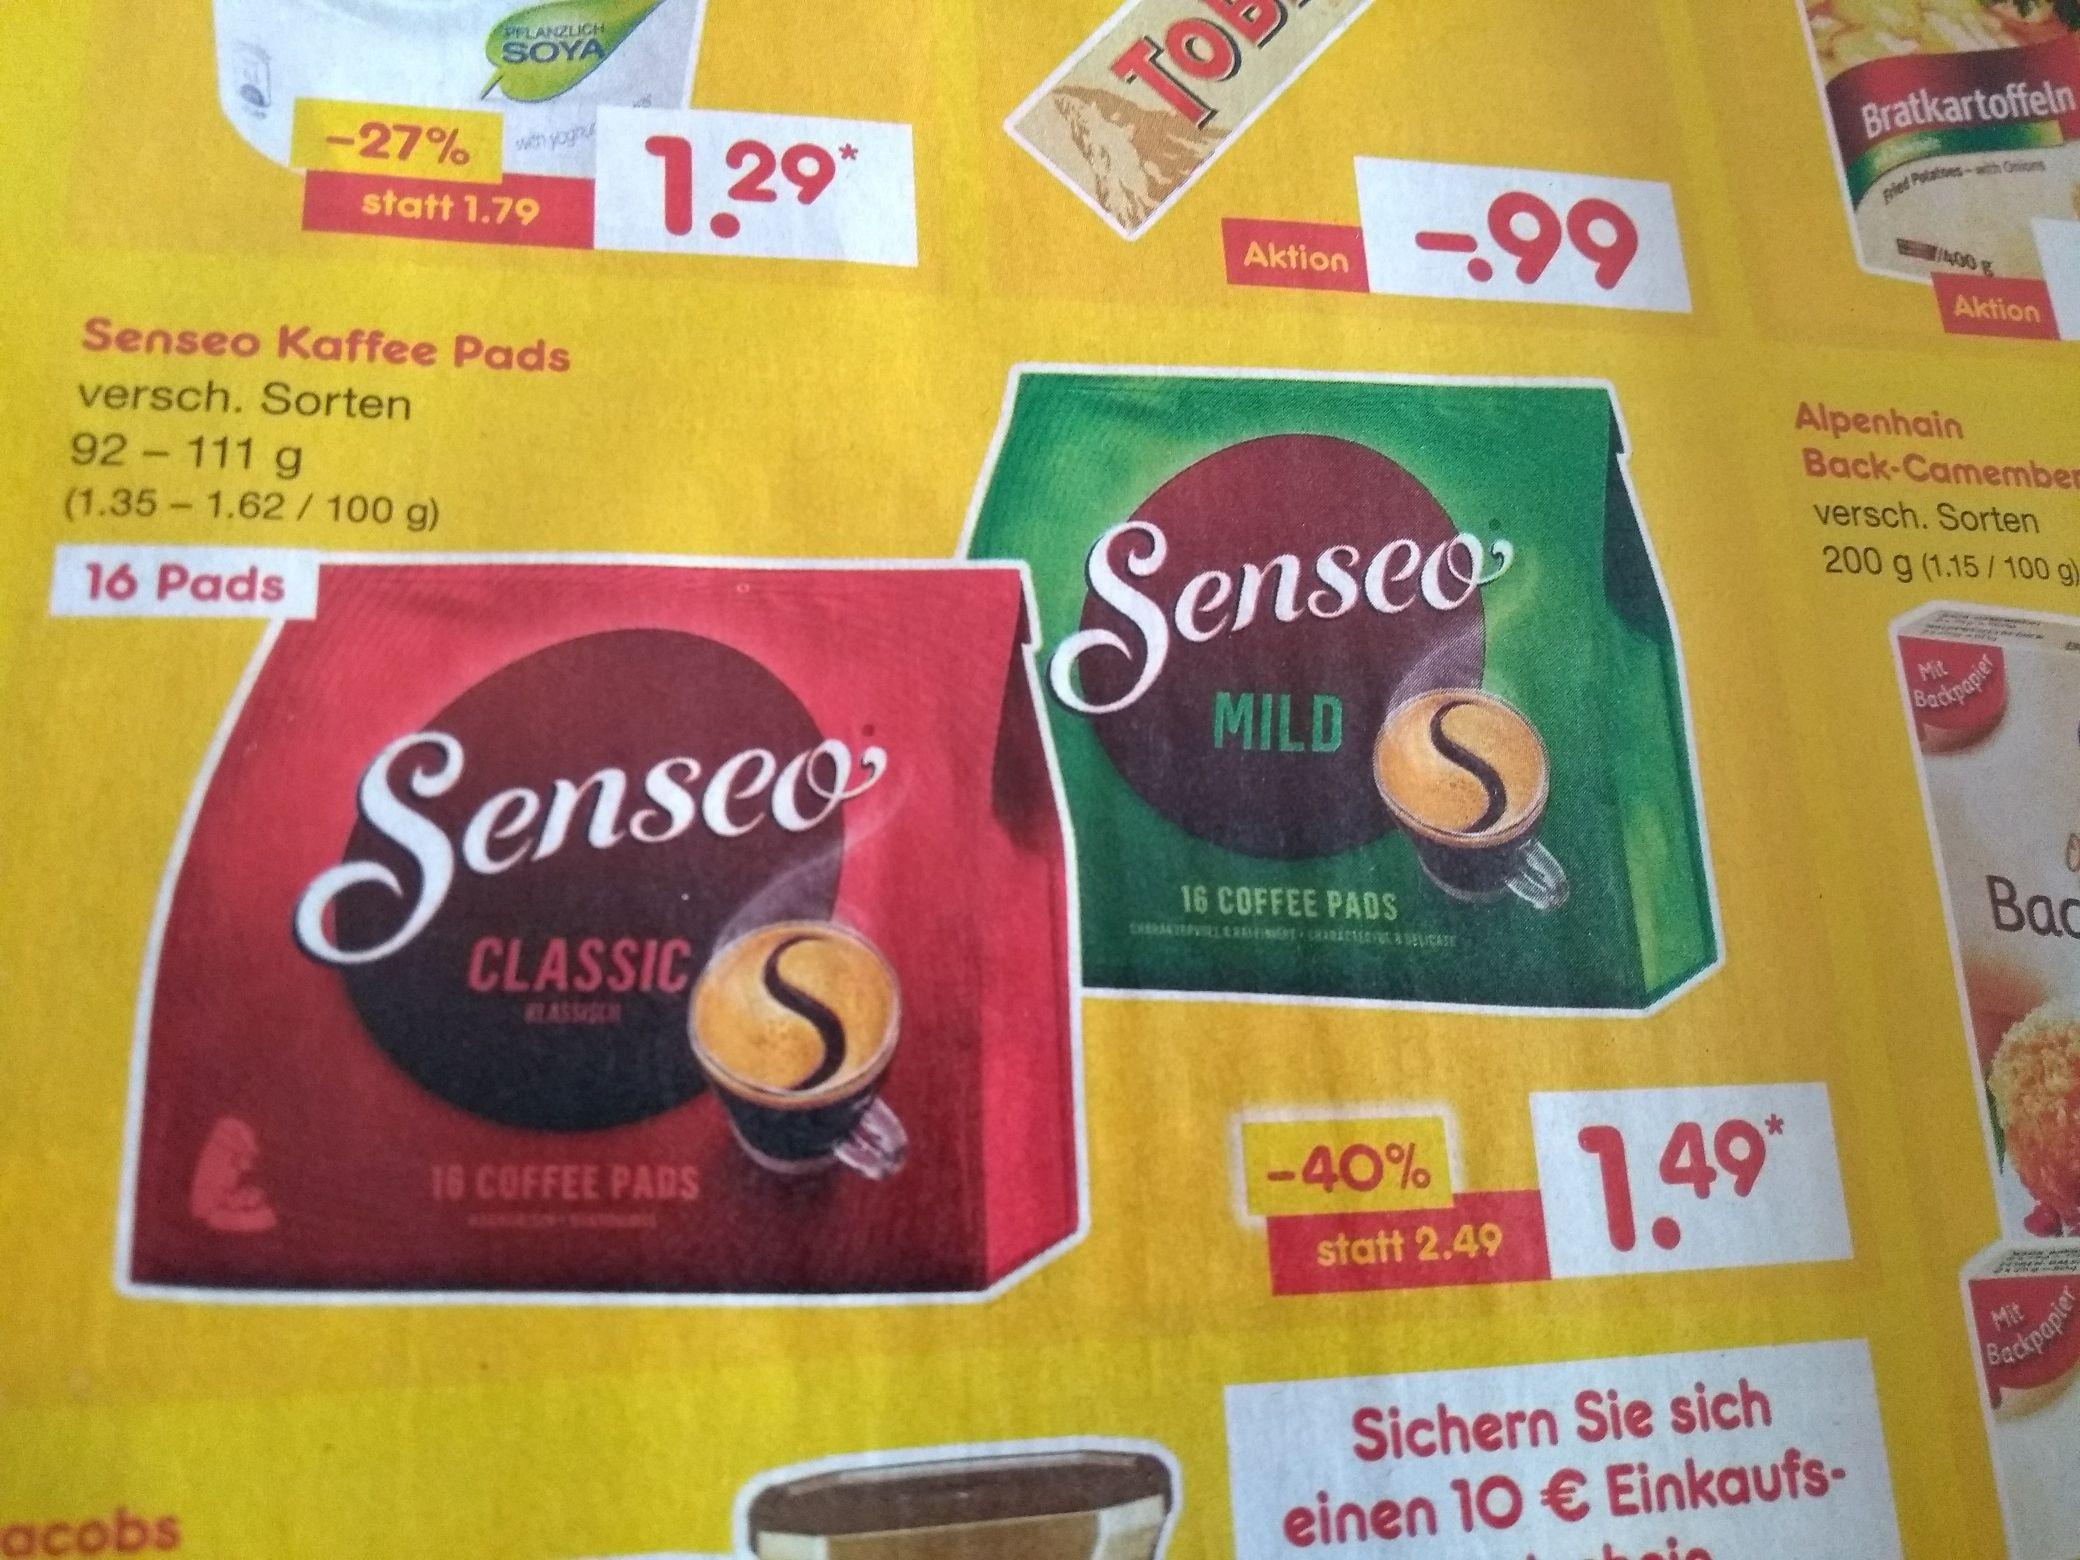 [Netto MD] Senseo Kaffeepads verschiedene Sorten ab 15.02.18